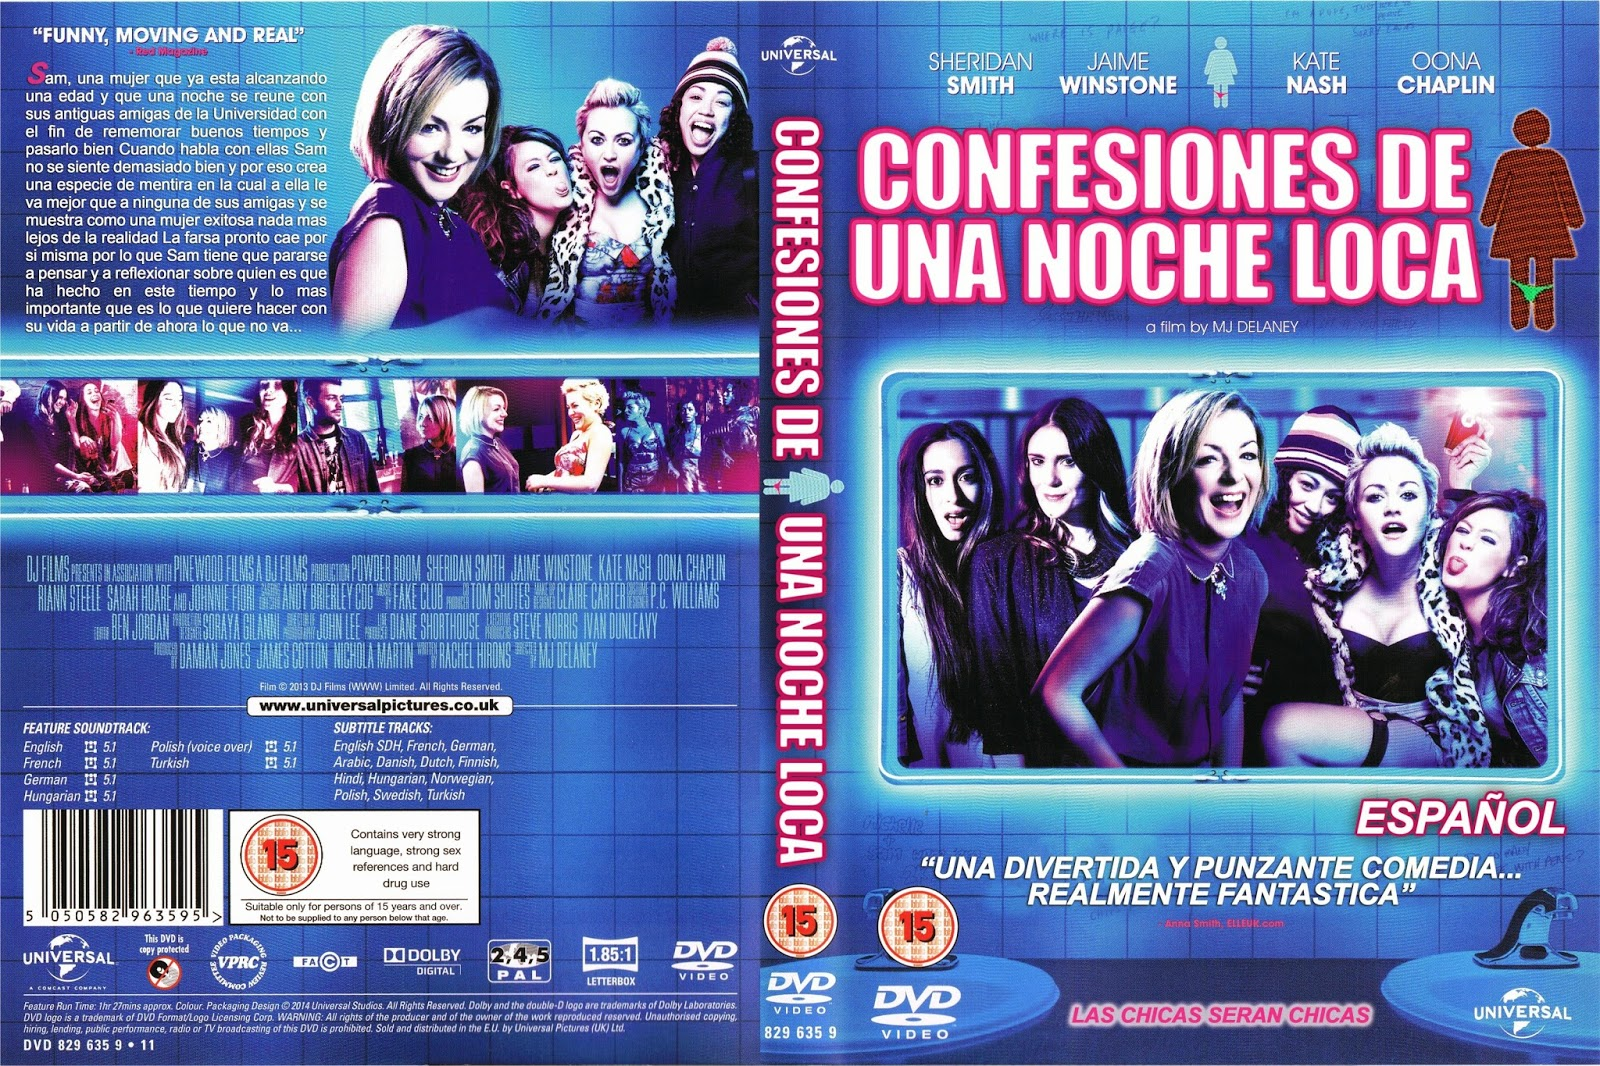 Movies world confesiones de una noche loca dvd for Divan una noche loca